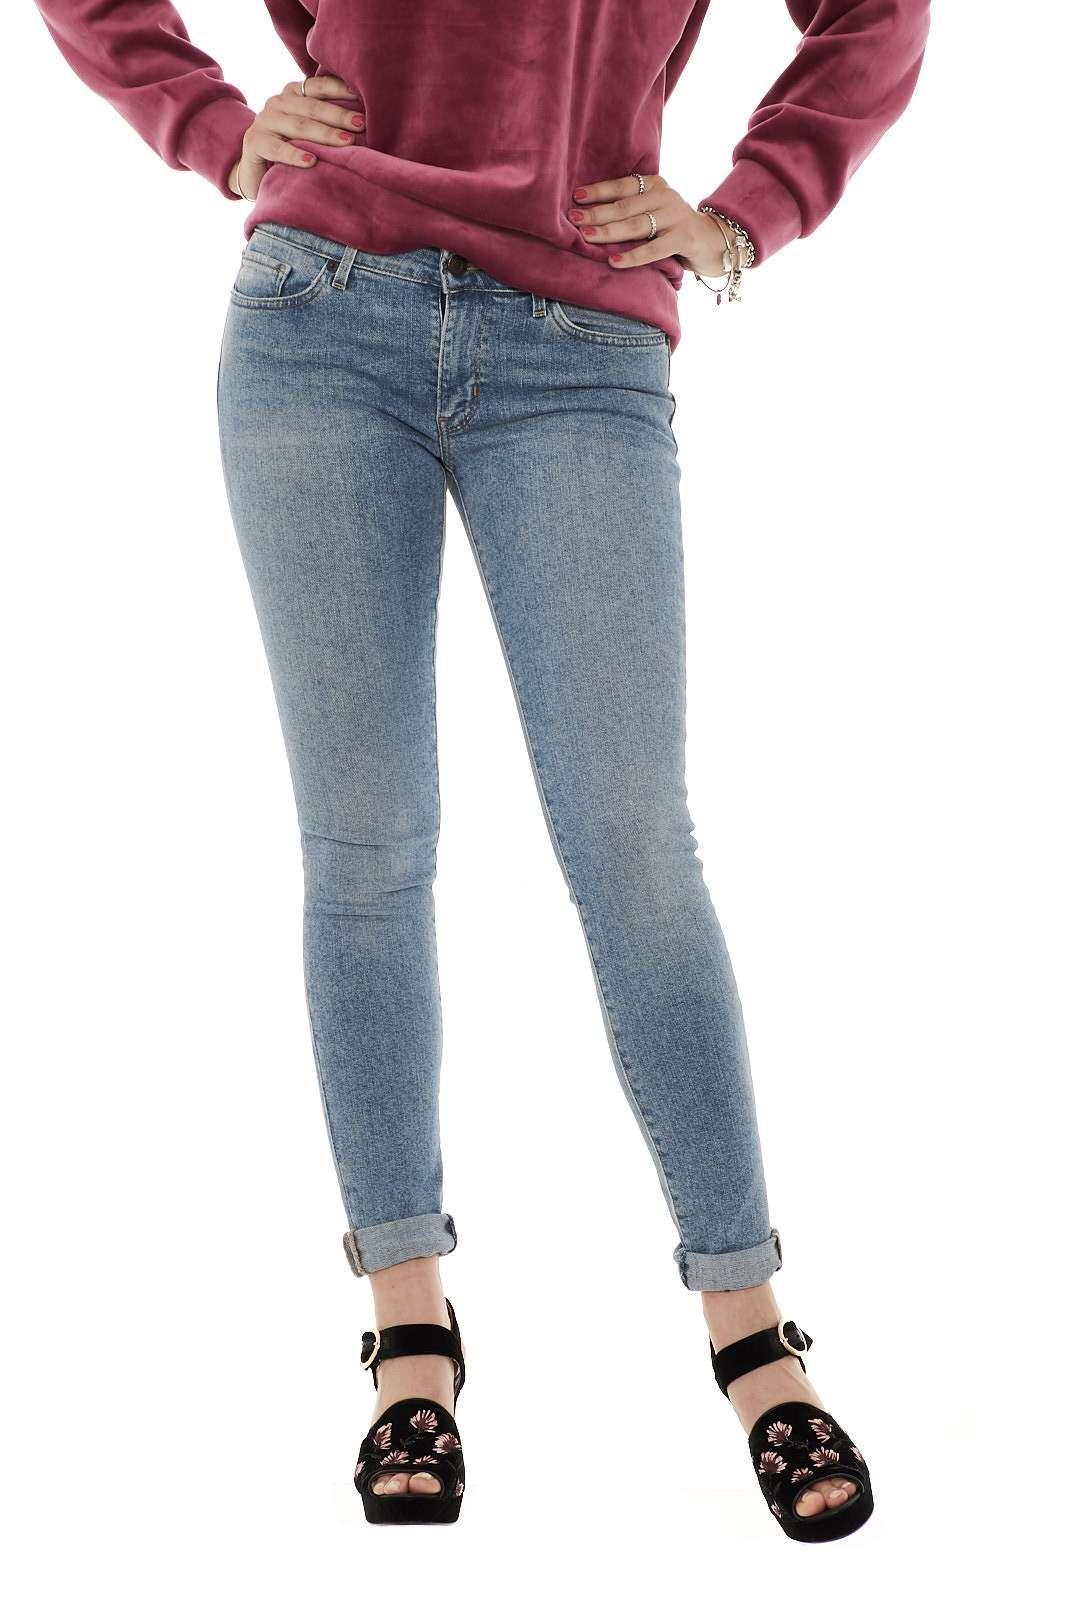 https://www.parmax.com/media/tmp/catalog/product/a/i/ai-outlet_parmax-jeans-donna-levis-18810100-a.jpg